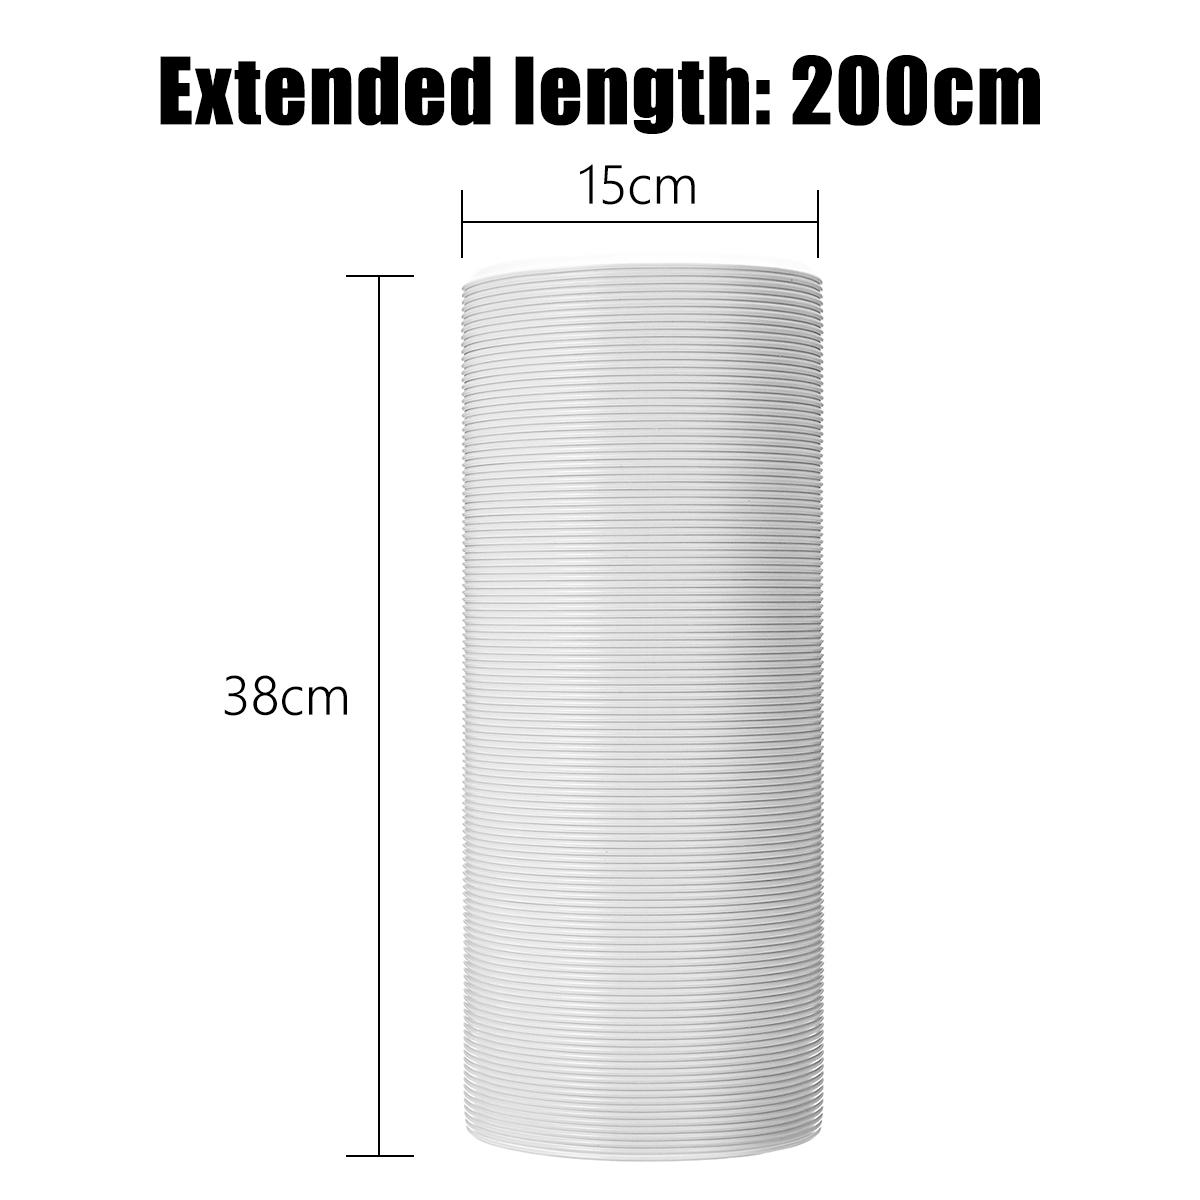 Details about 5 9''/15cm Exhaust Hose Vent Tube AC Unit Duct For LG  Portable Air Conditioner